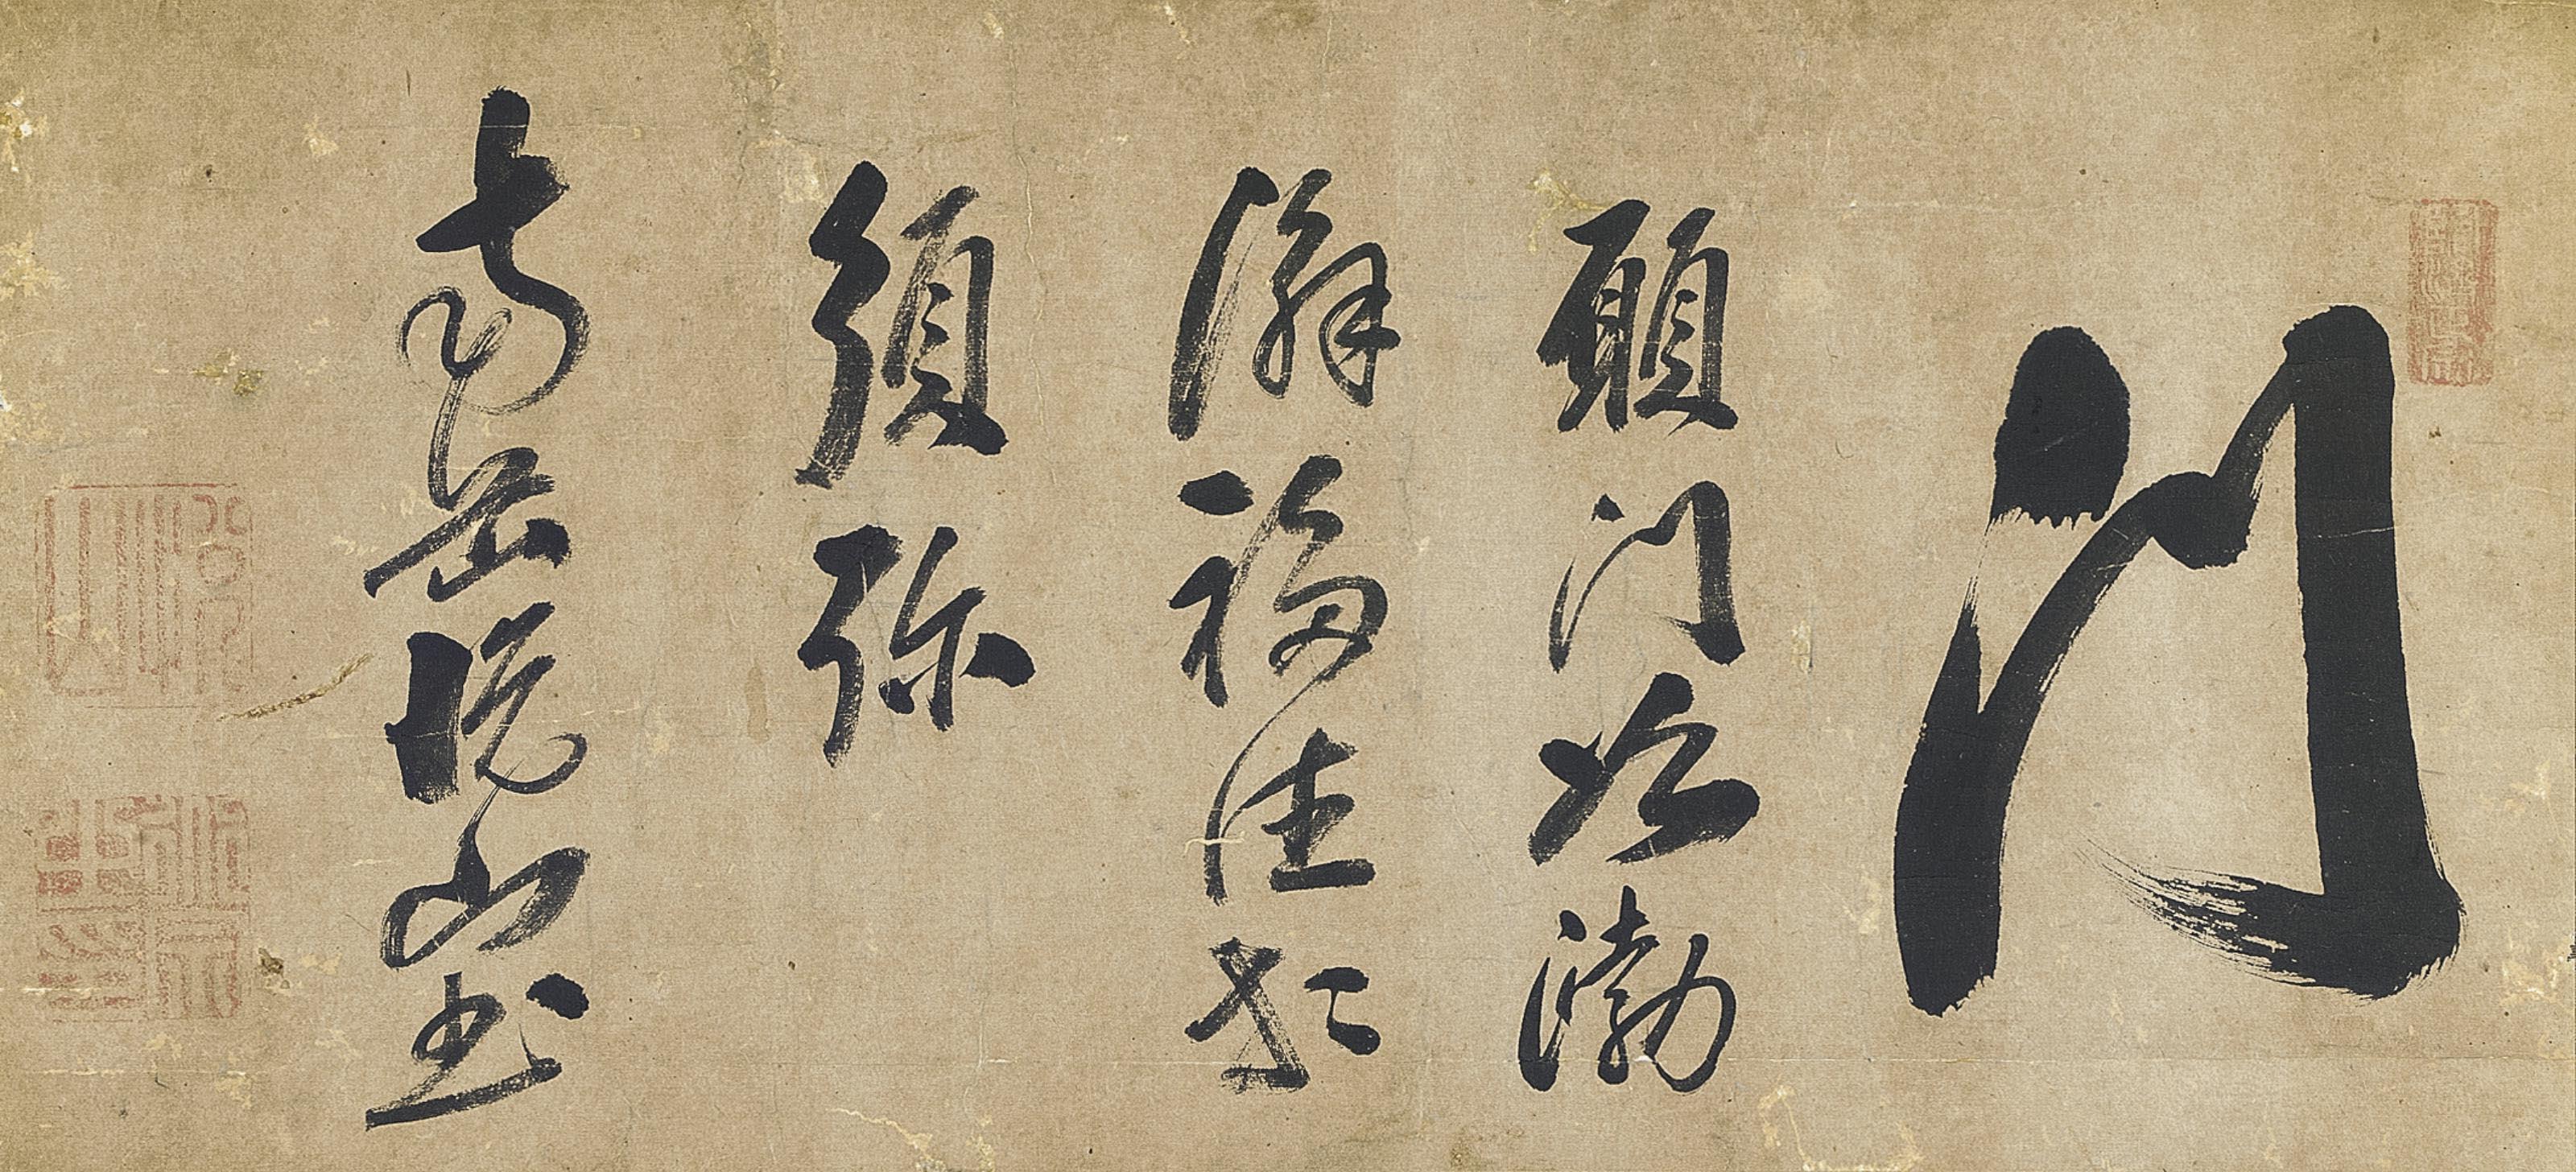 Etsuzan Doshu (1629-1709)